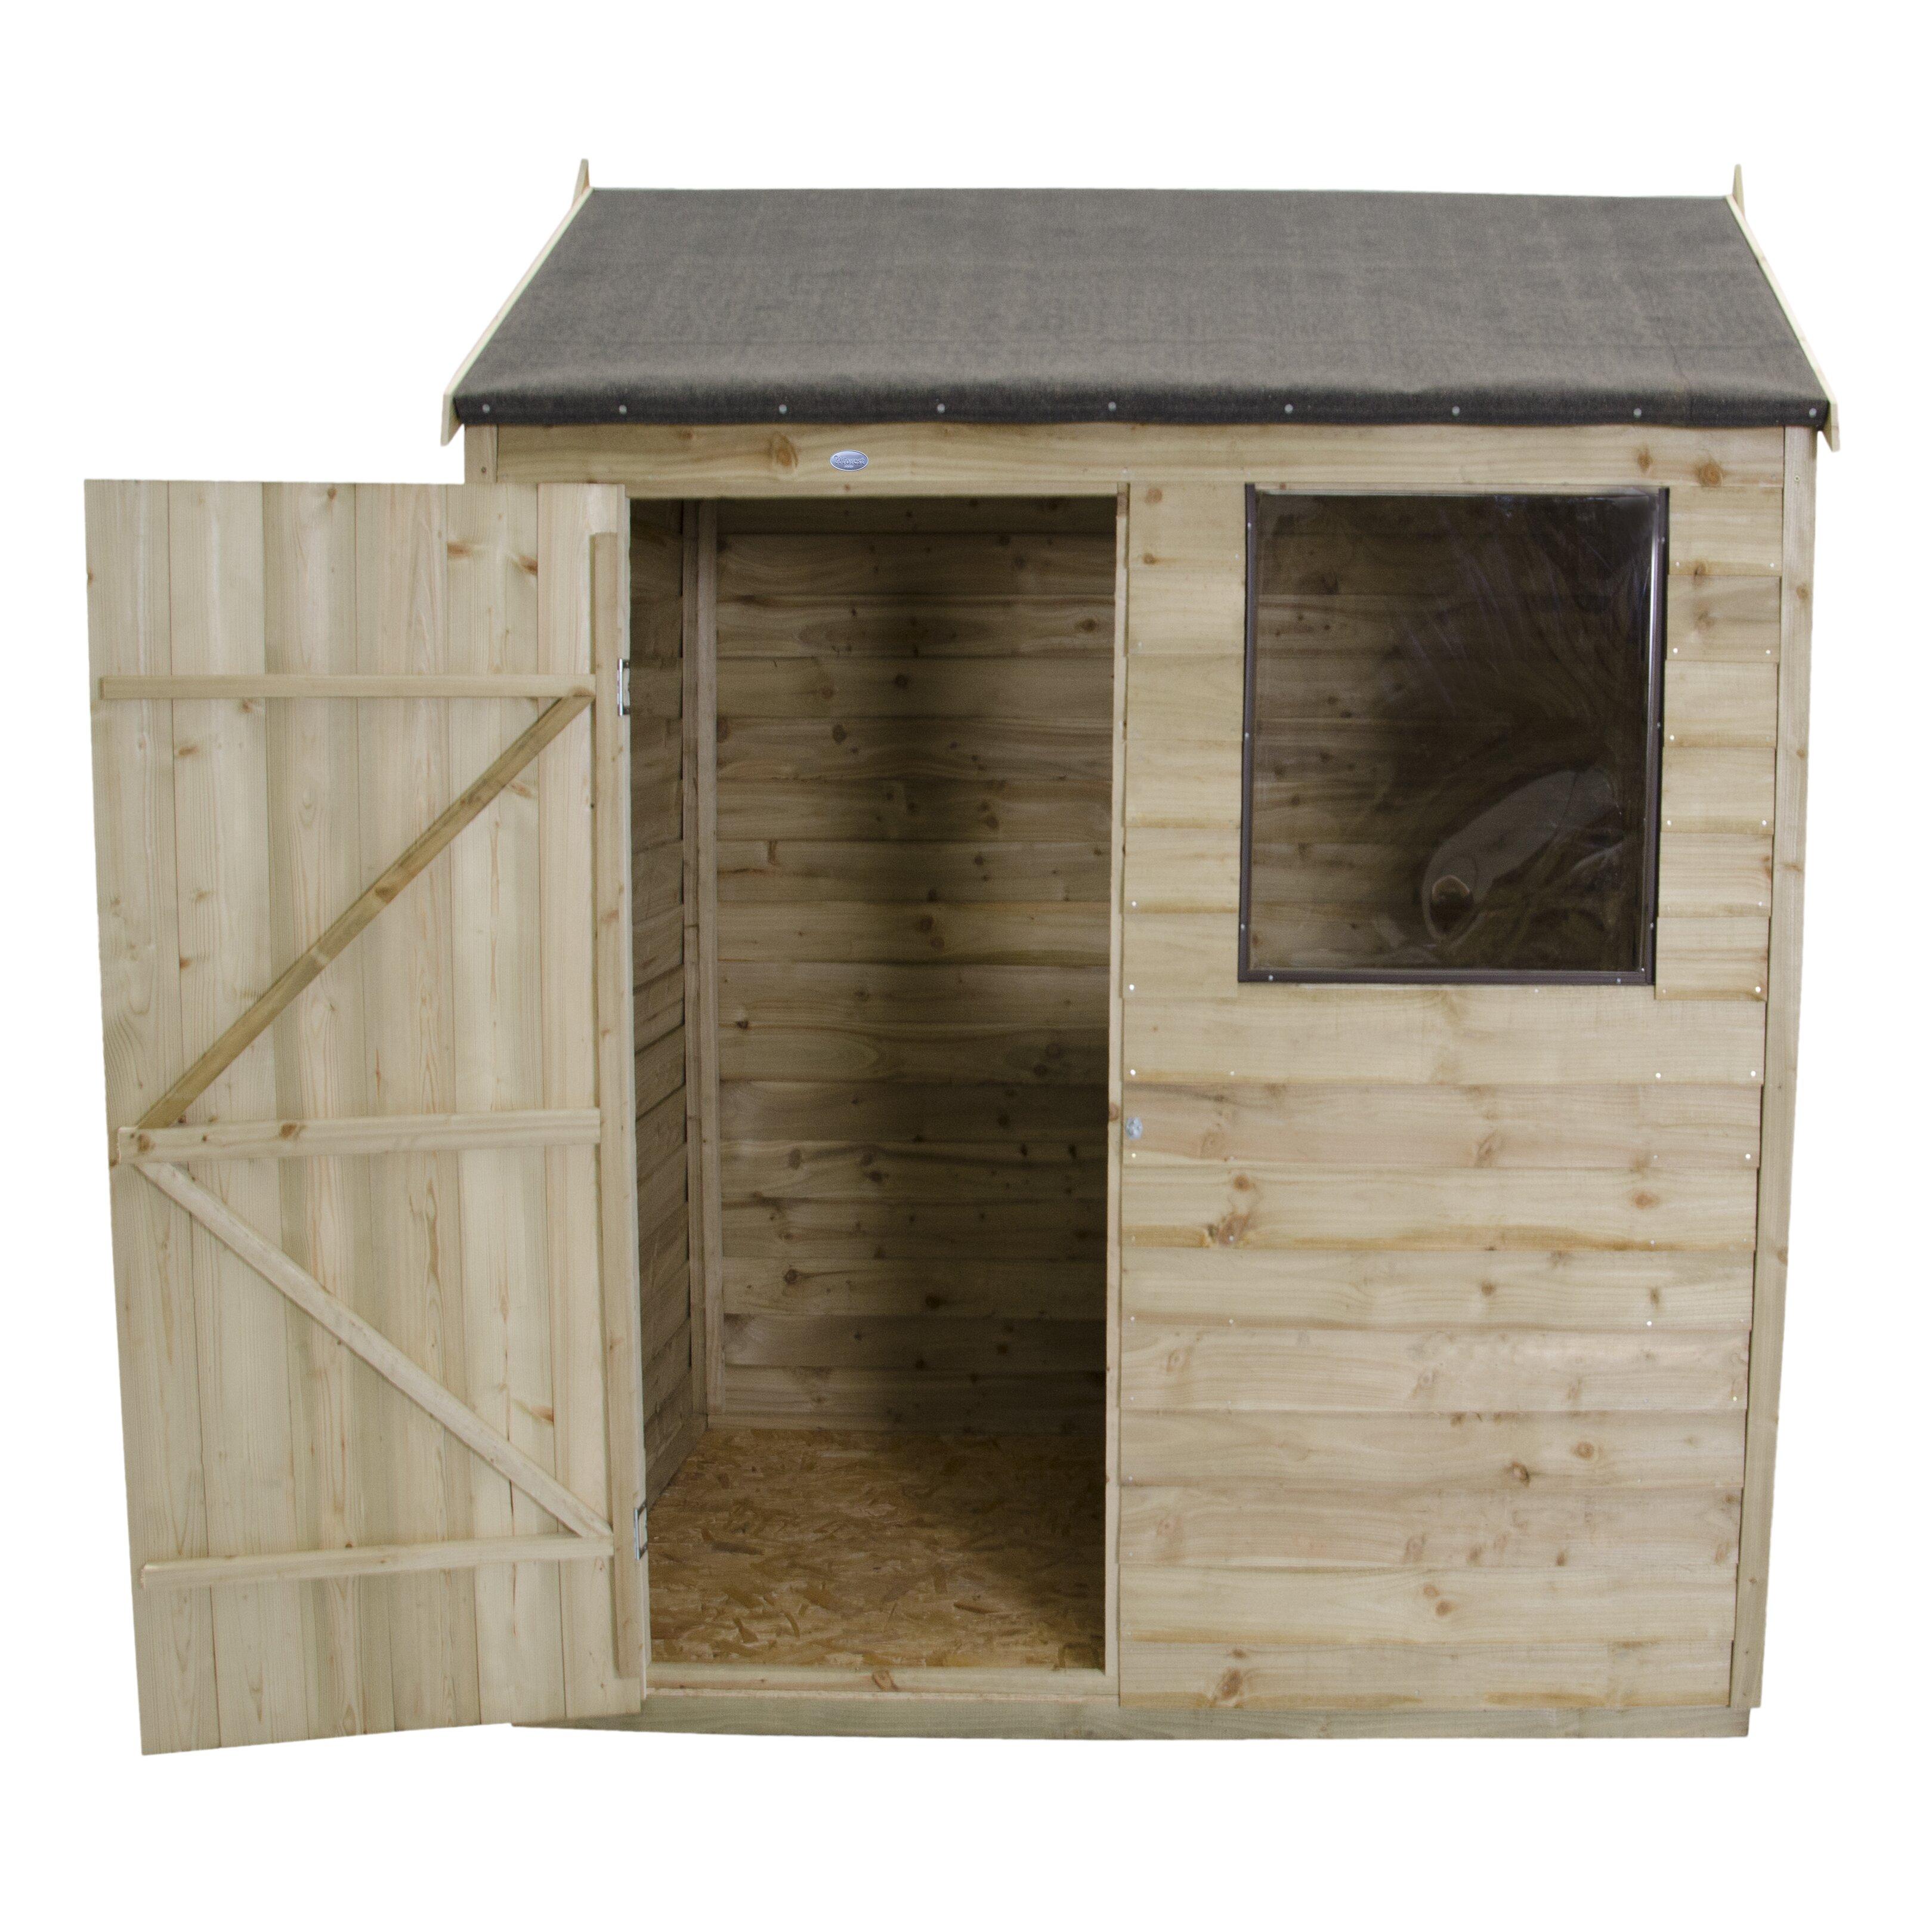 Forest garden 6 x 4 wooden storage shed wayfair uk for Garden shed 6 x 4